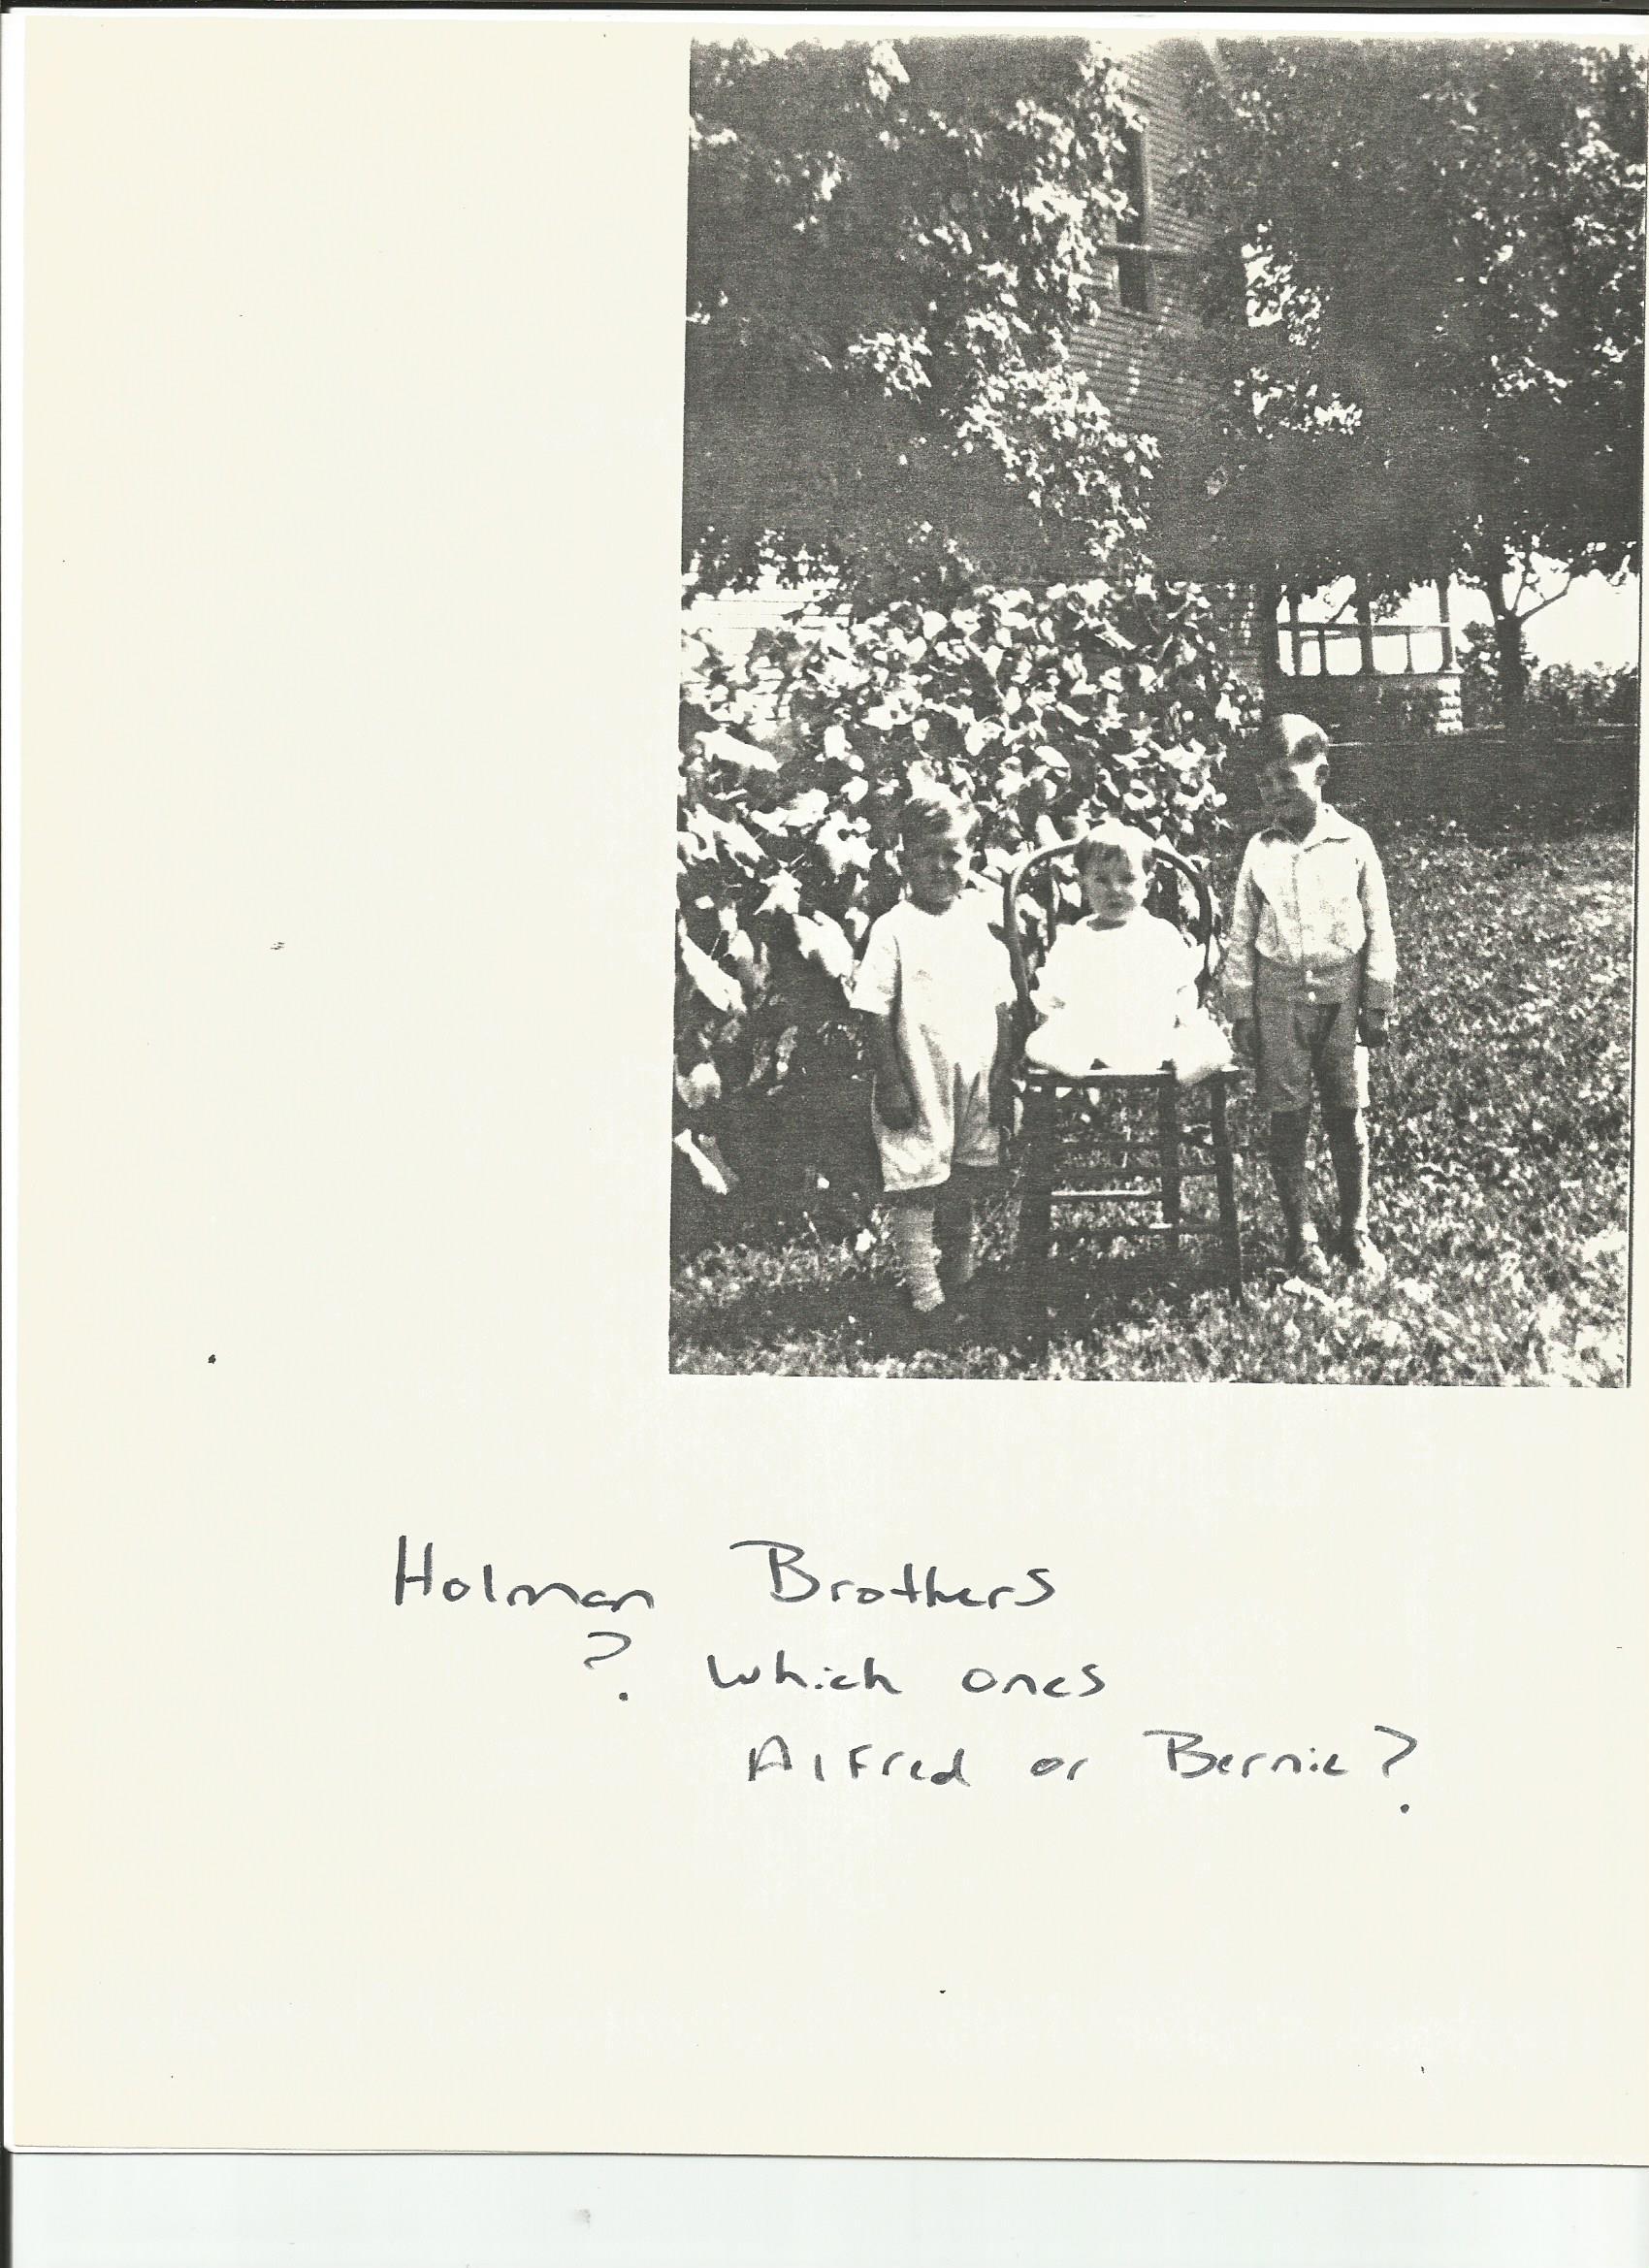 Bernard Holman